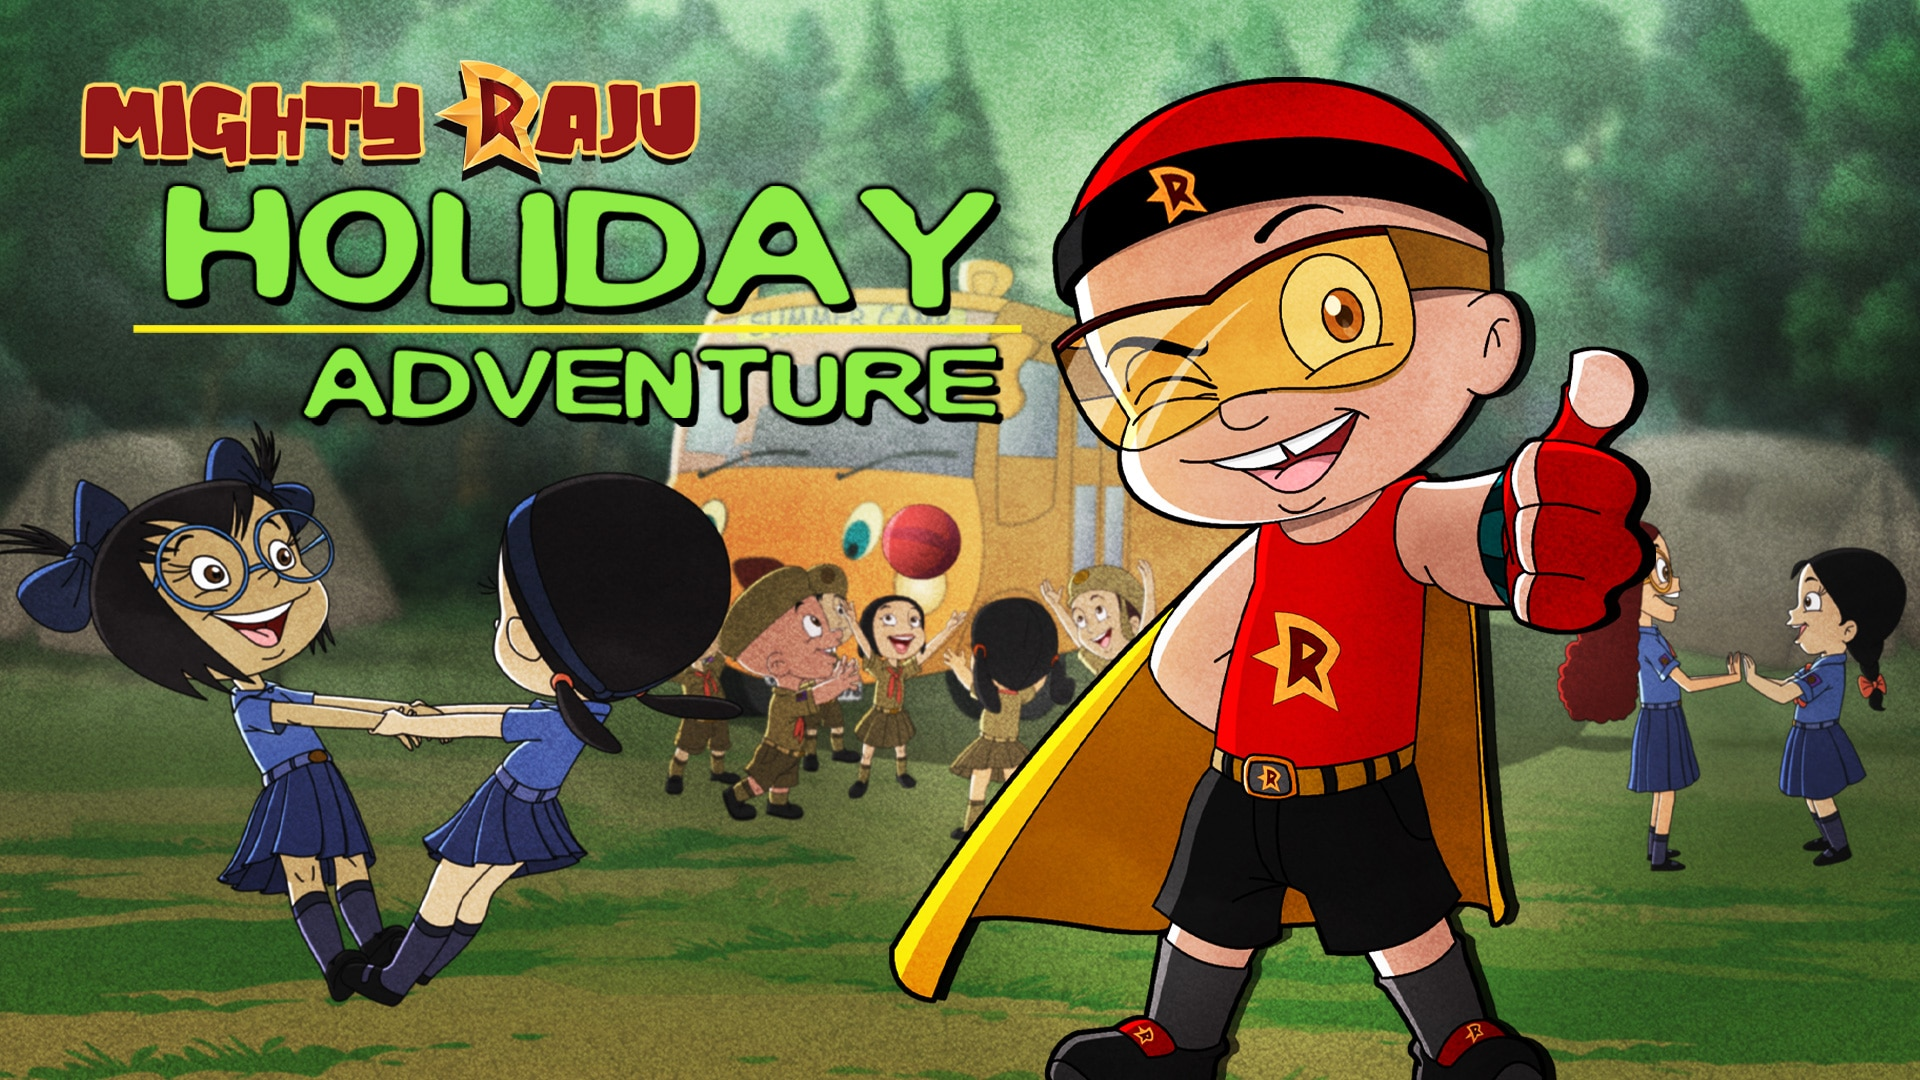 Mighty Raju Holiday Adventure Full Movie In Telugu